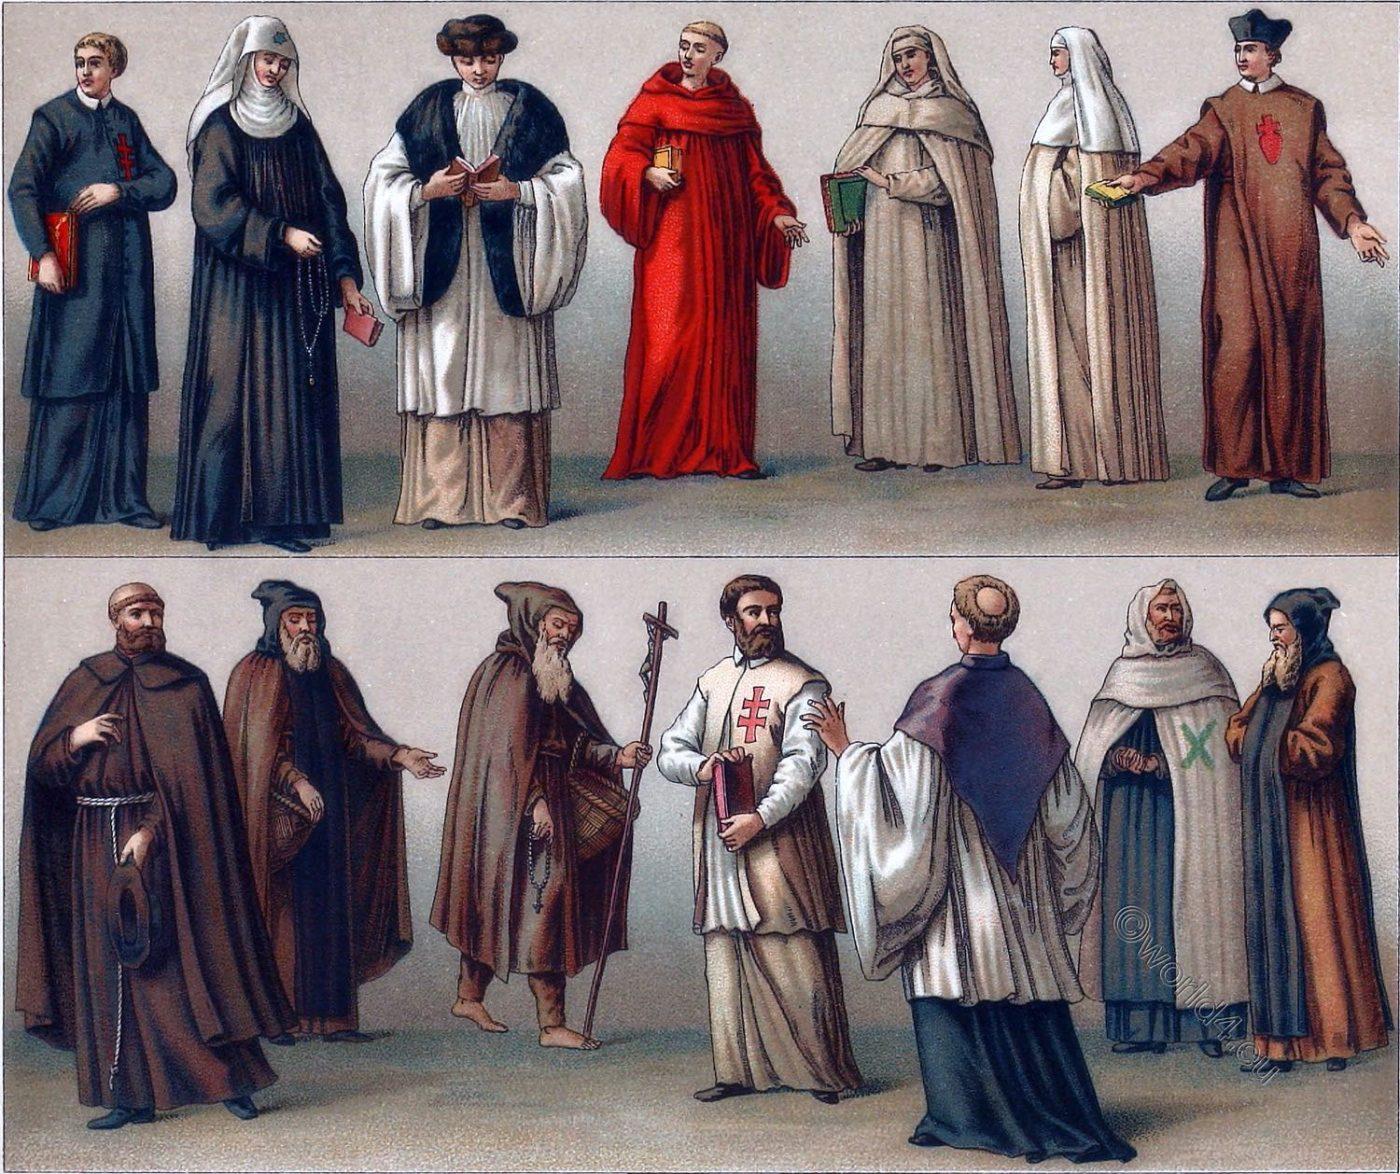 spiritual orders, monastic, costumes, habit, monks, nuns,